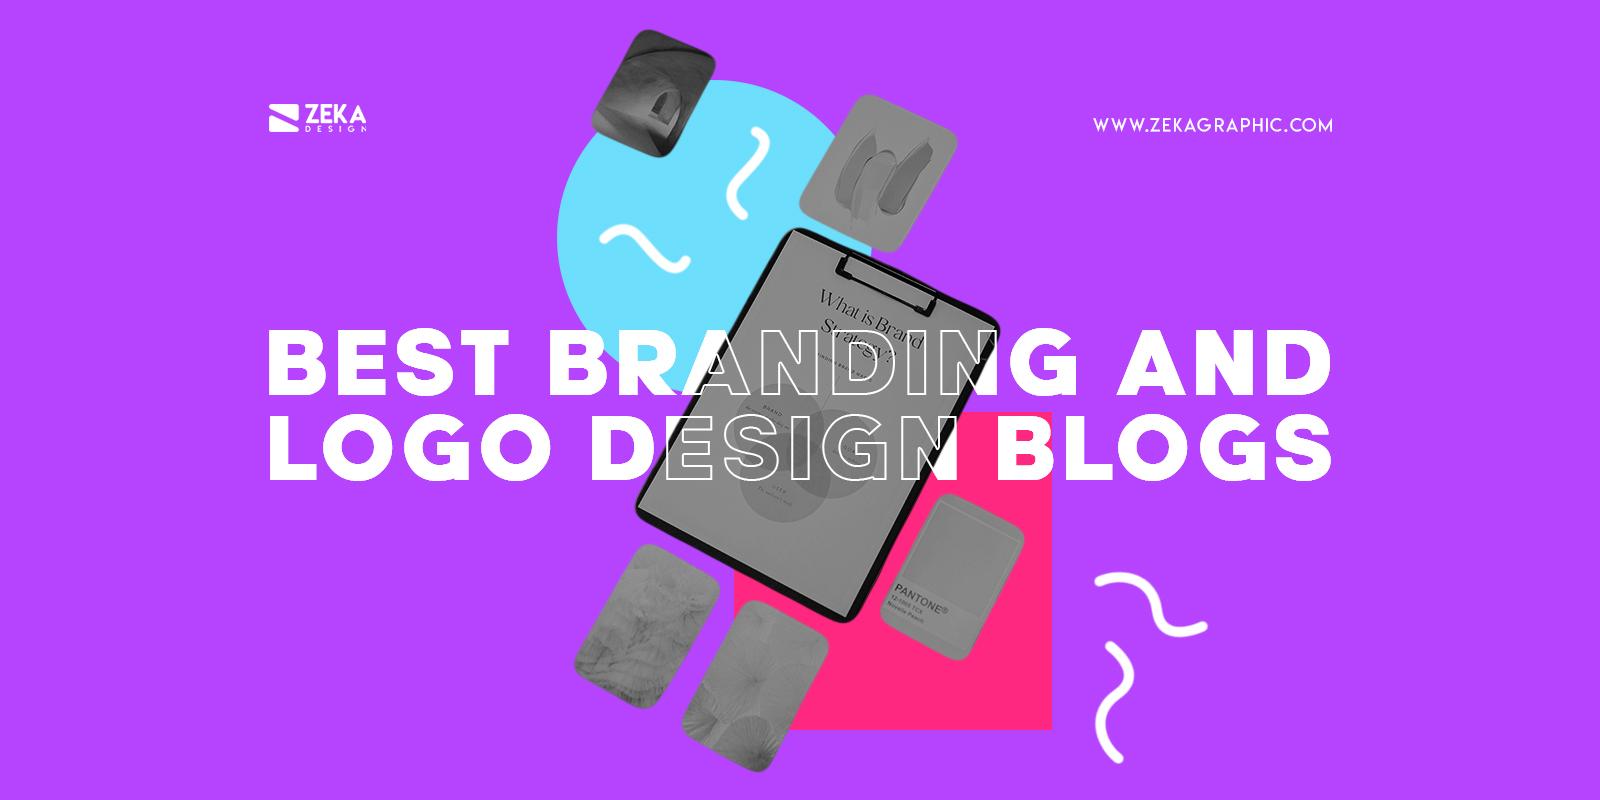 Best Branding and Logo Design Blogs